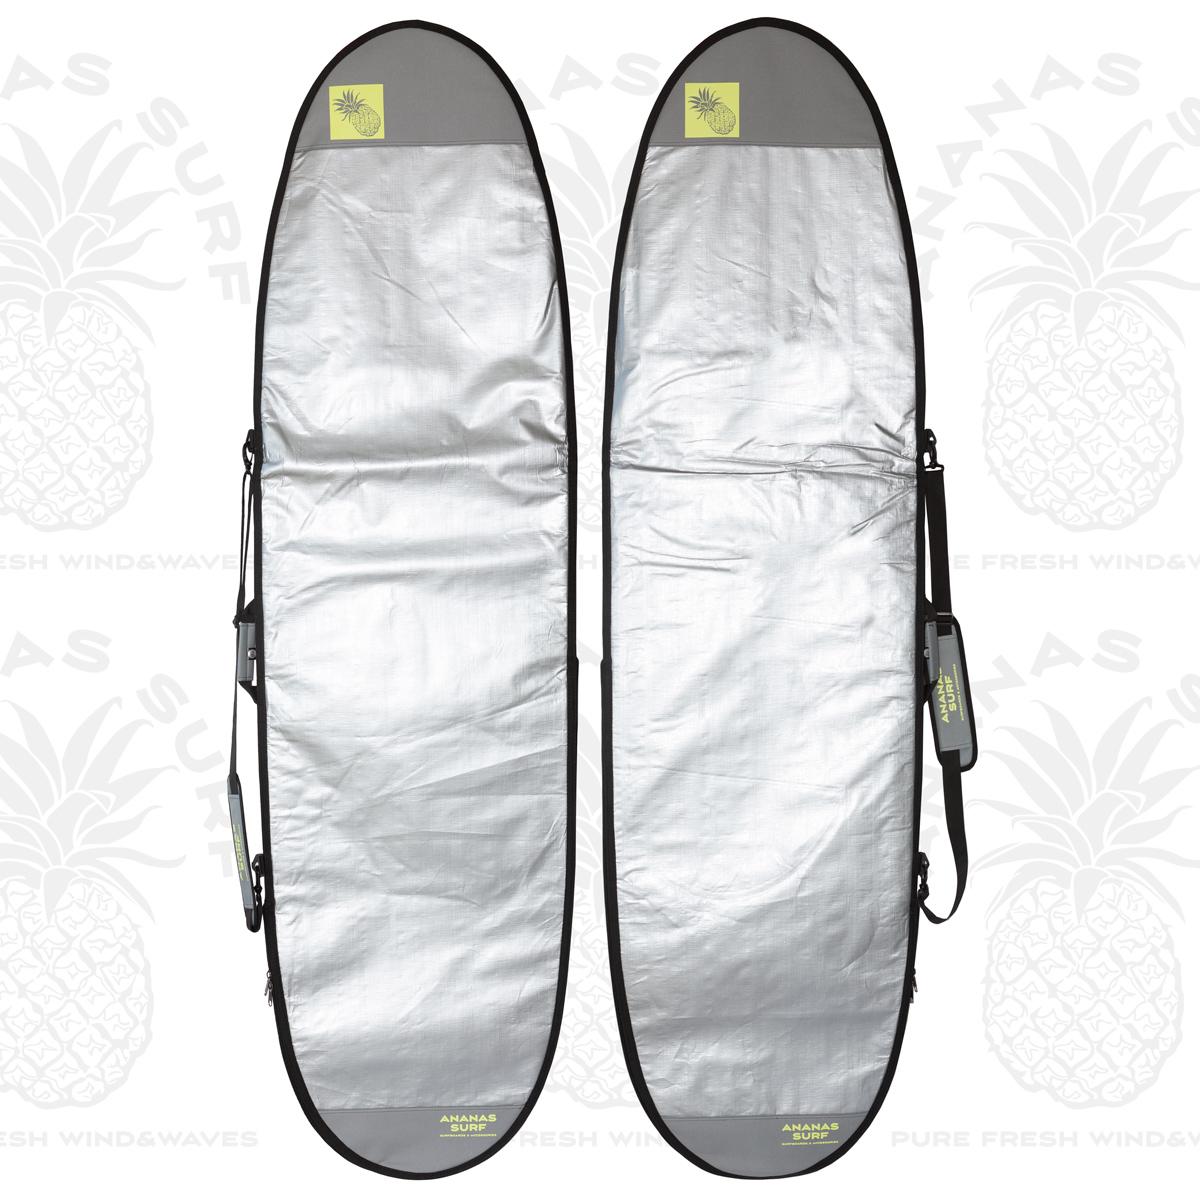 "Ananas Surf surfboard boardbag 7'6"" funboard style"